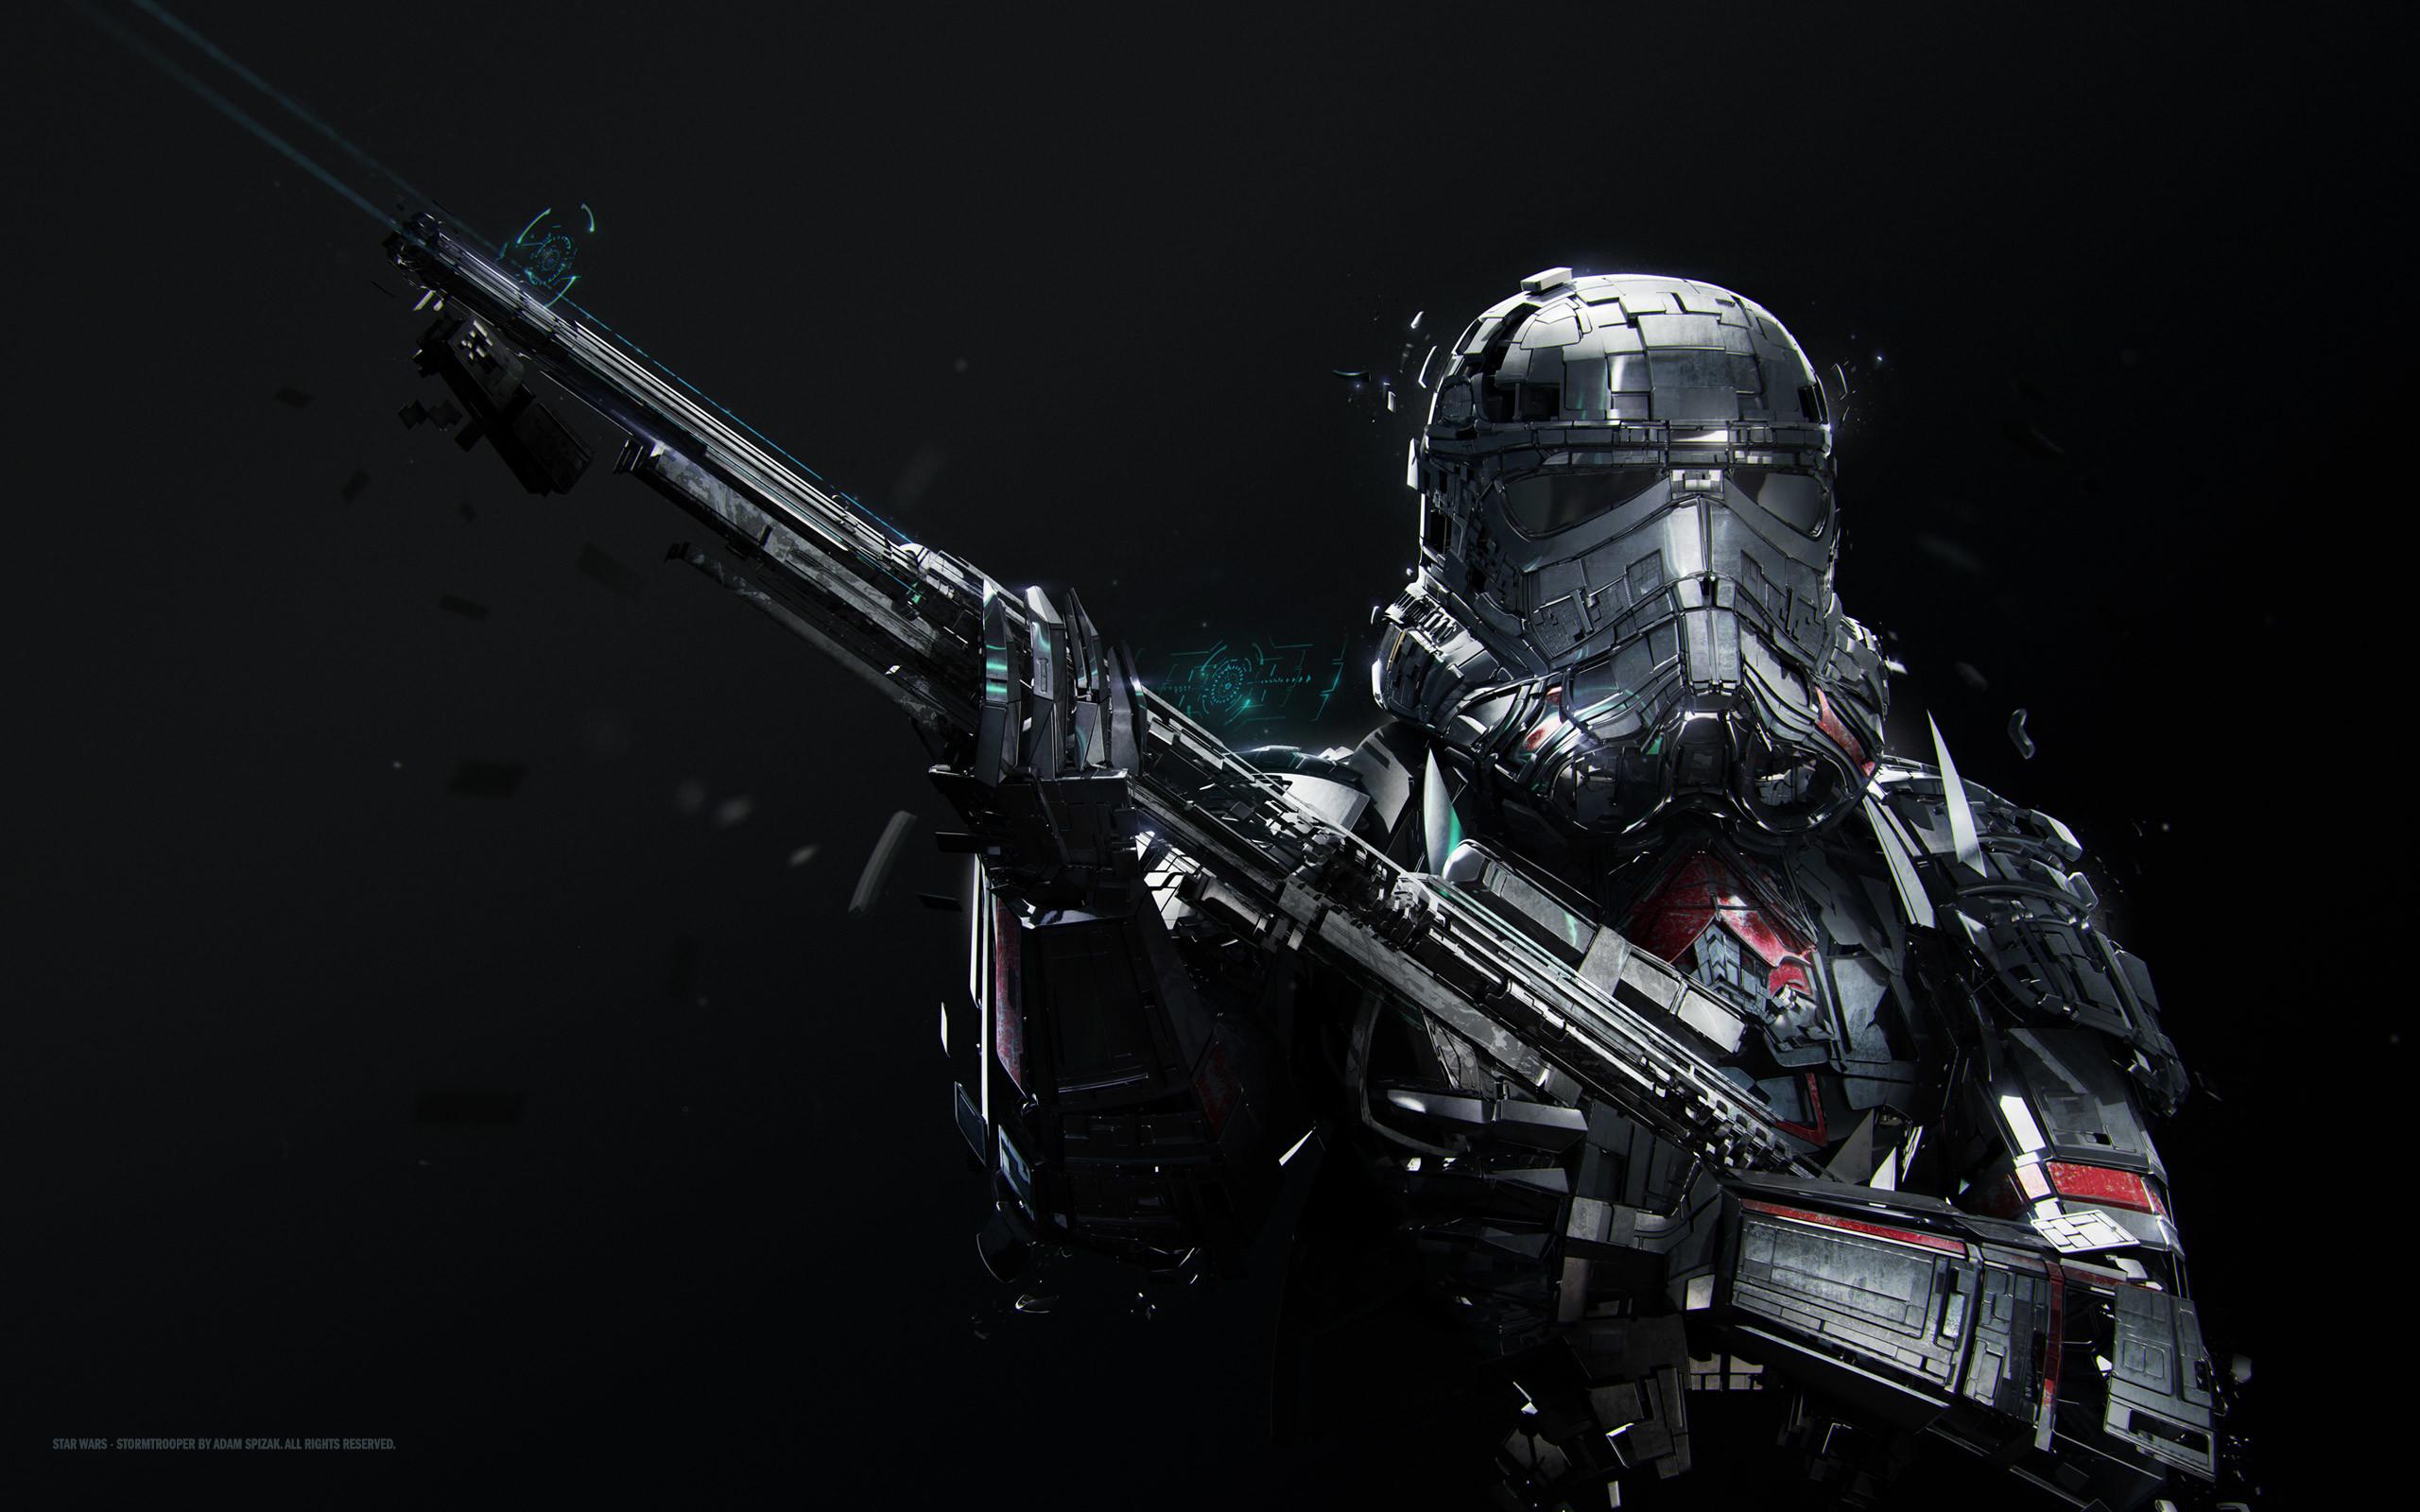 Star Wars Stormtrooper 1366×768 Resolution